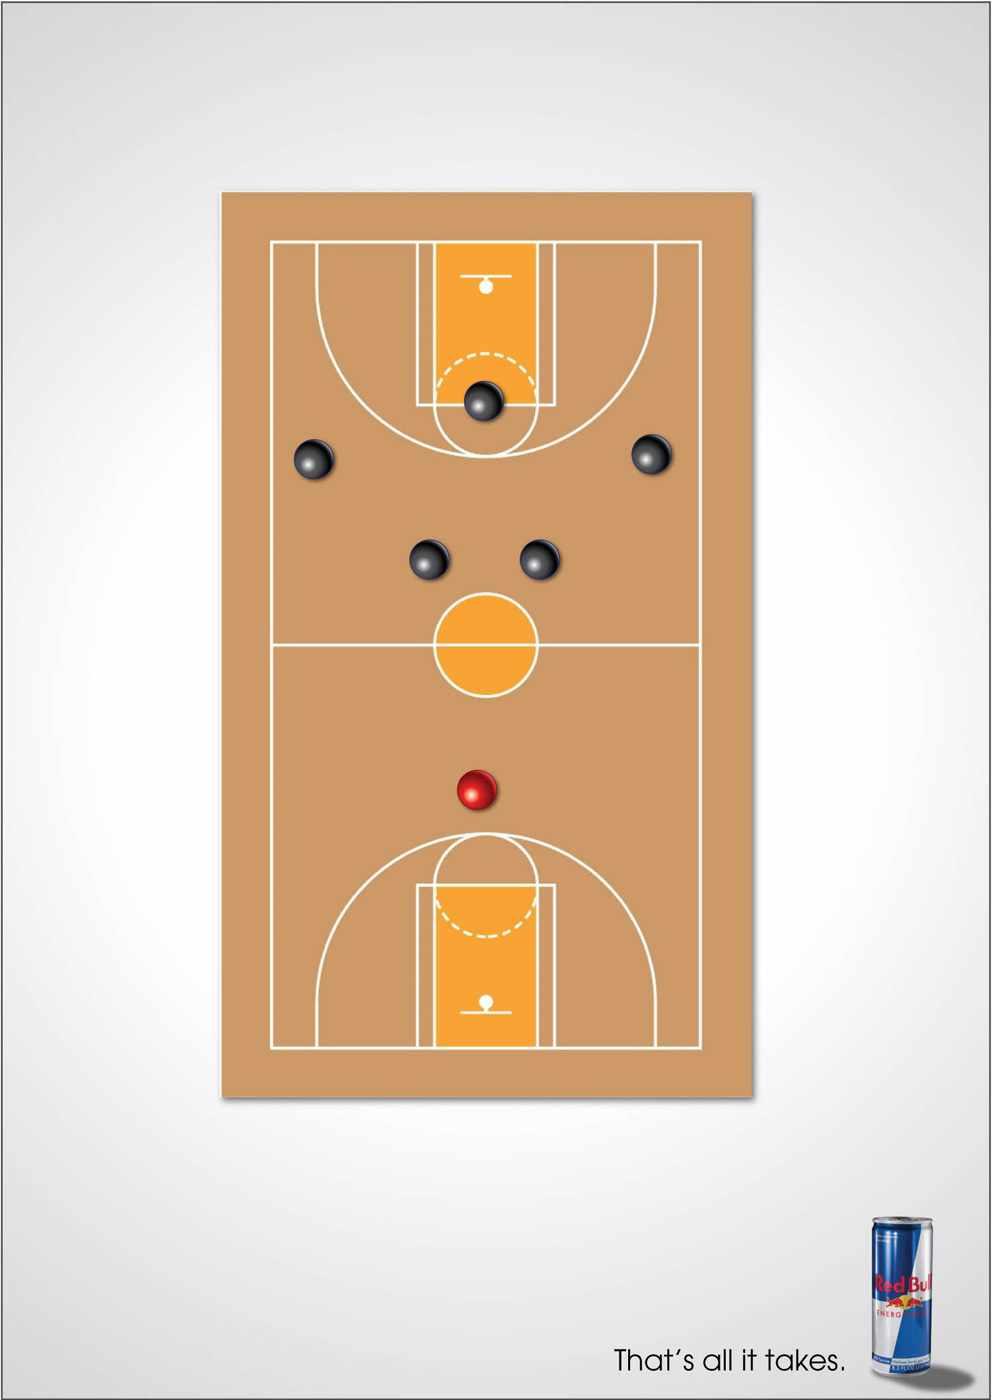 14RedBullBasketball